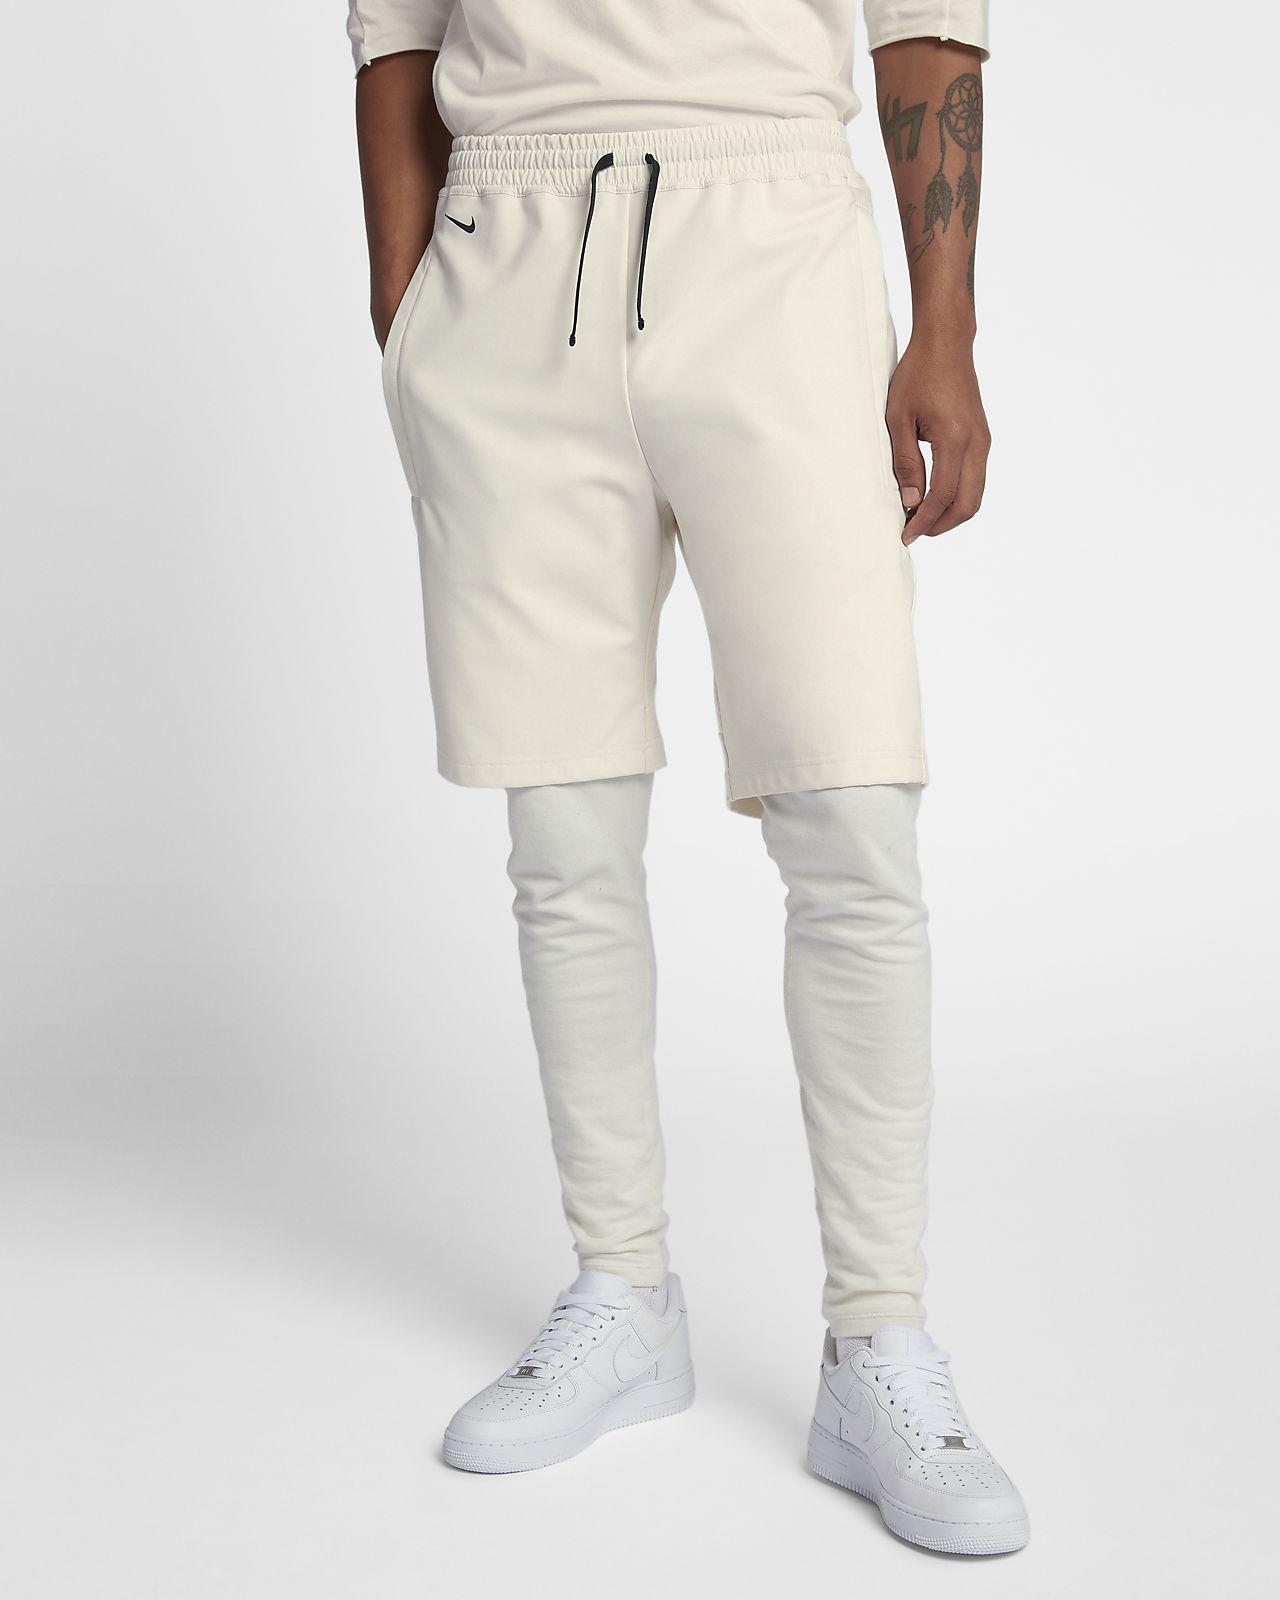 Shorts para hombre NikeLab AAE 2.0